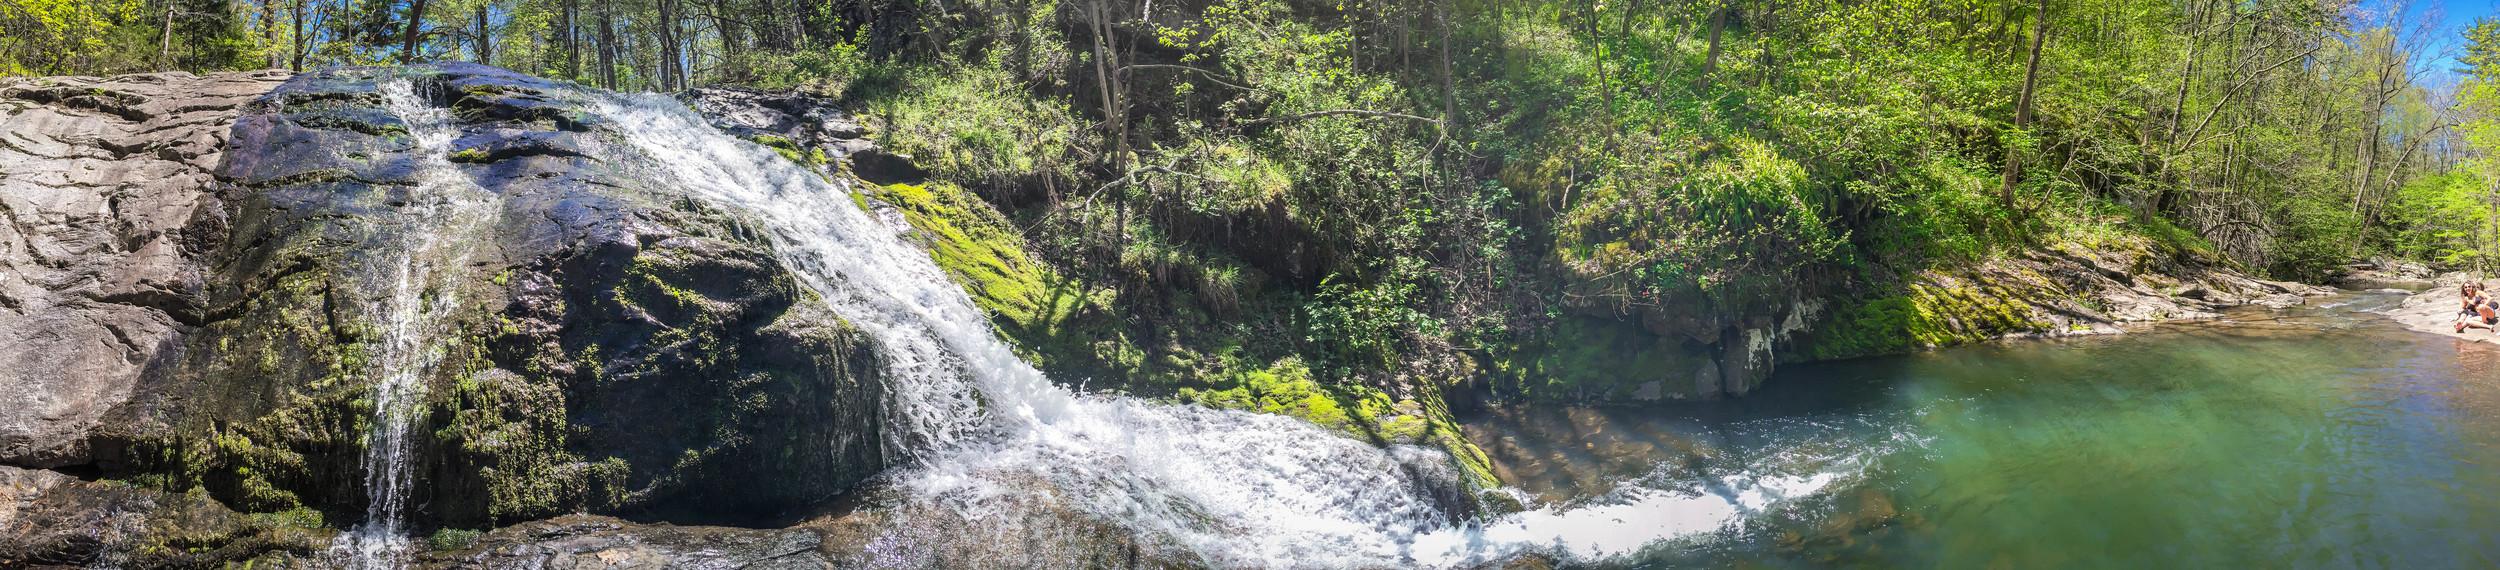 Waterfalls and pools